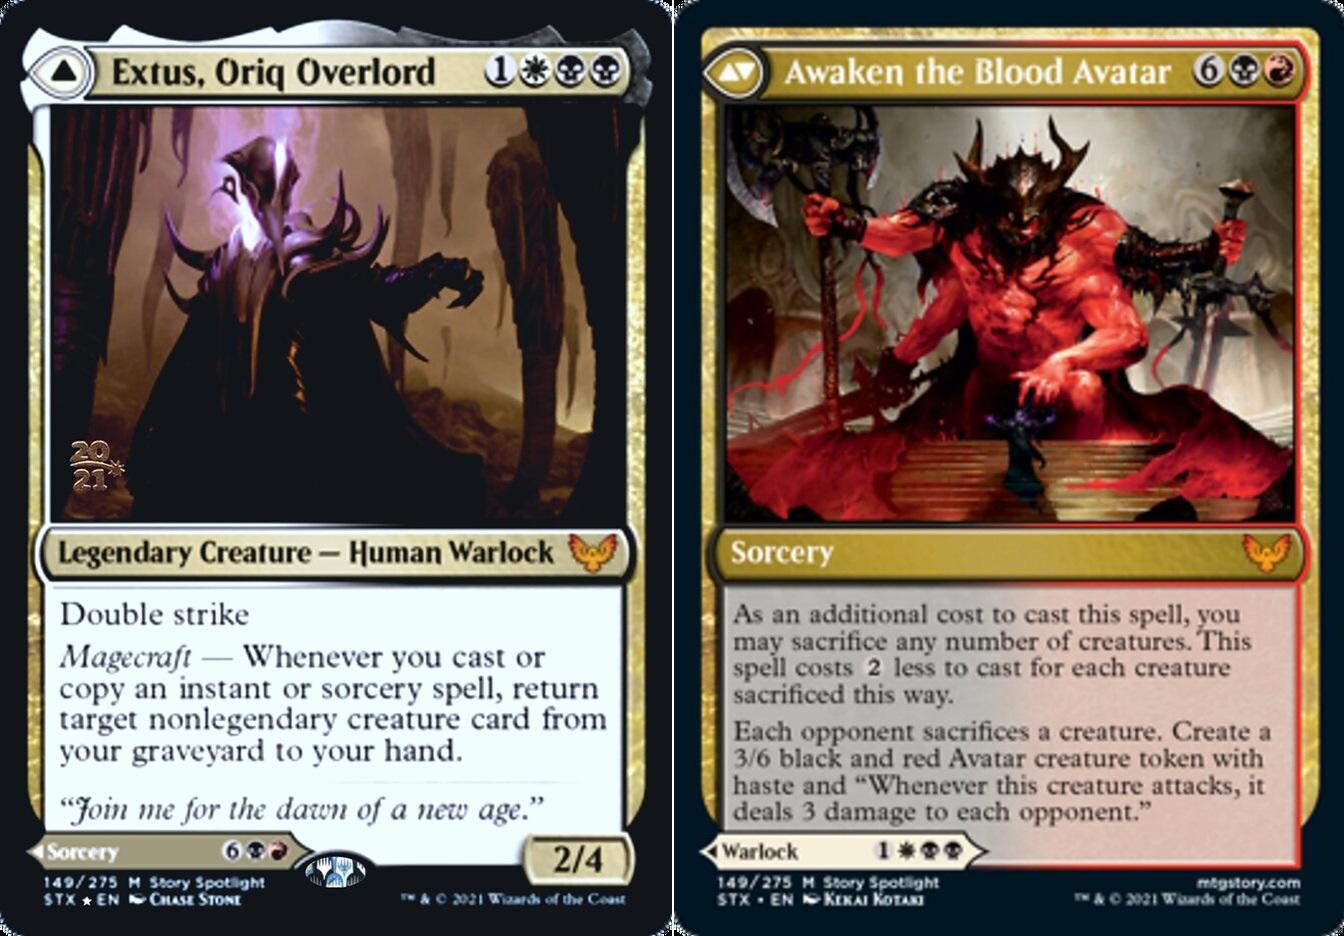 Extus, Oriq Overlord // Awaken the Blood Avatar - Foil - Prerelease Promo